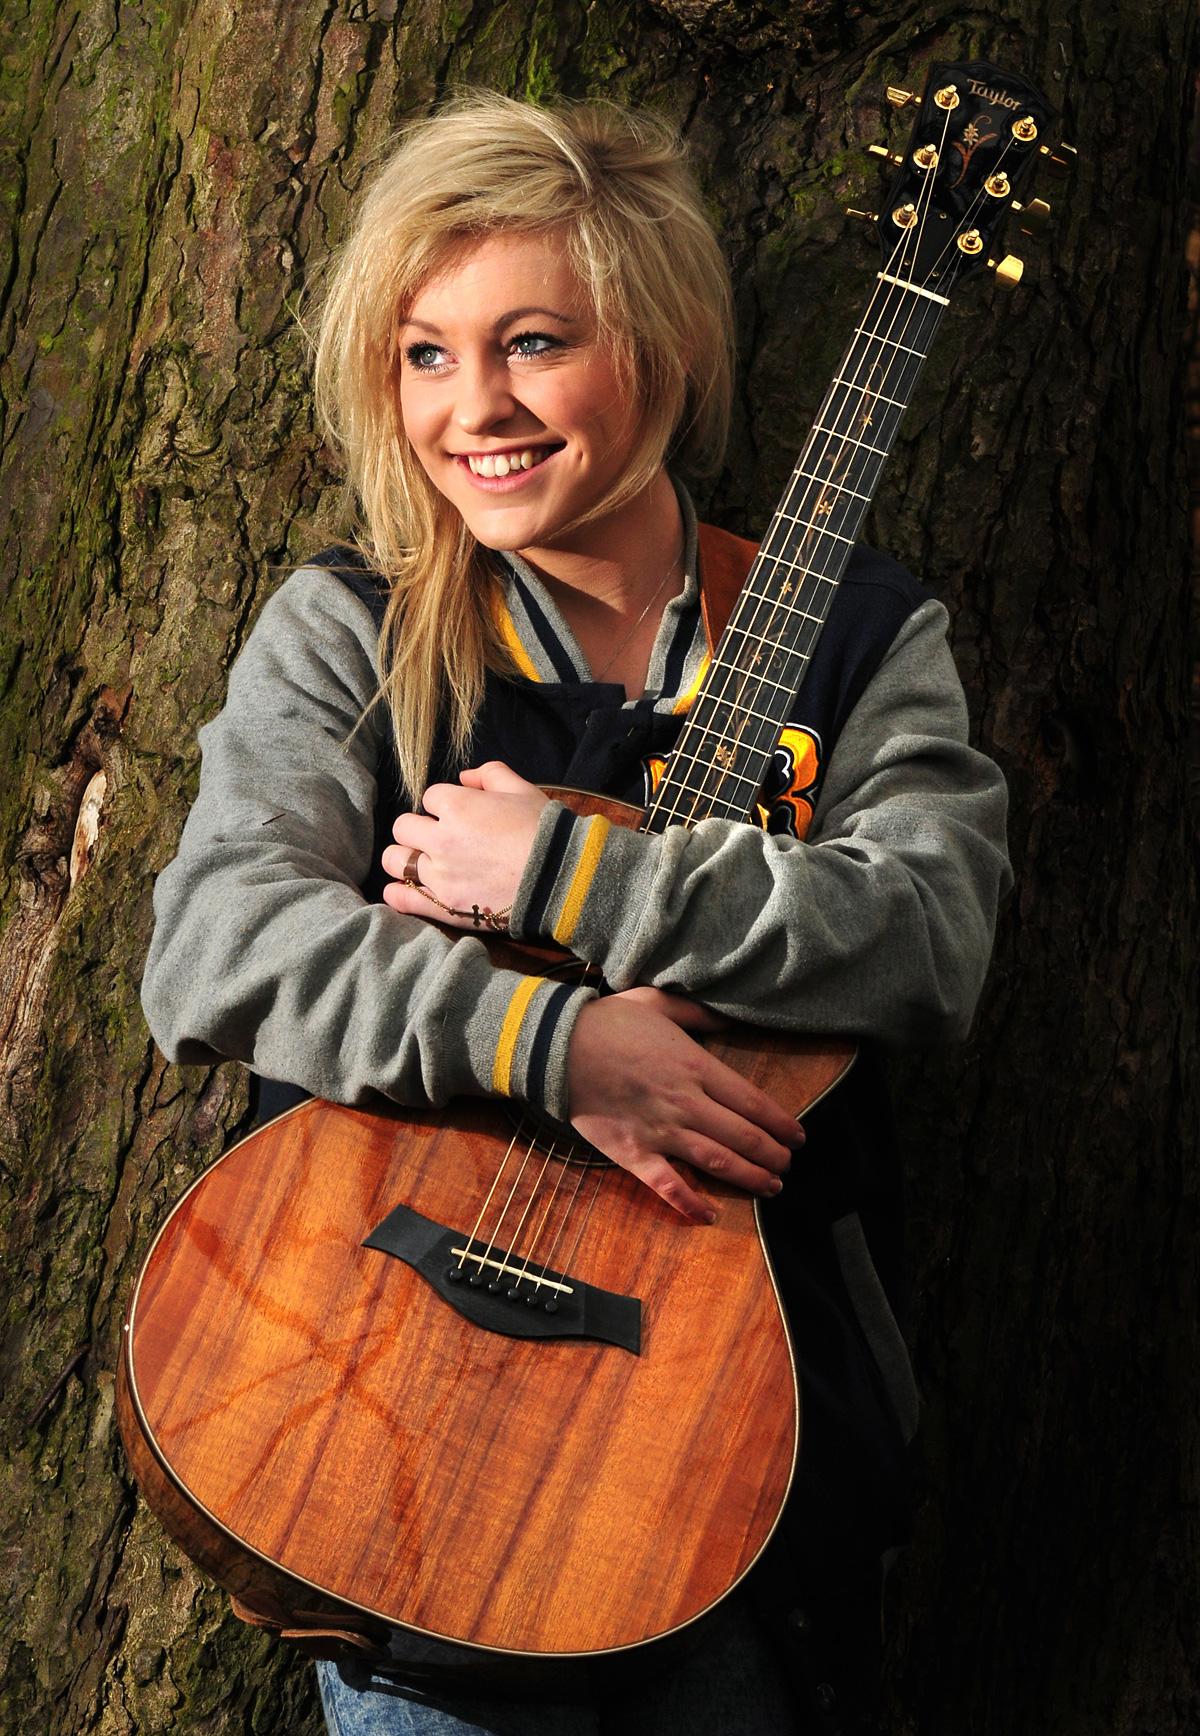 Teen Singer Photos Video 109